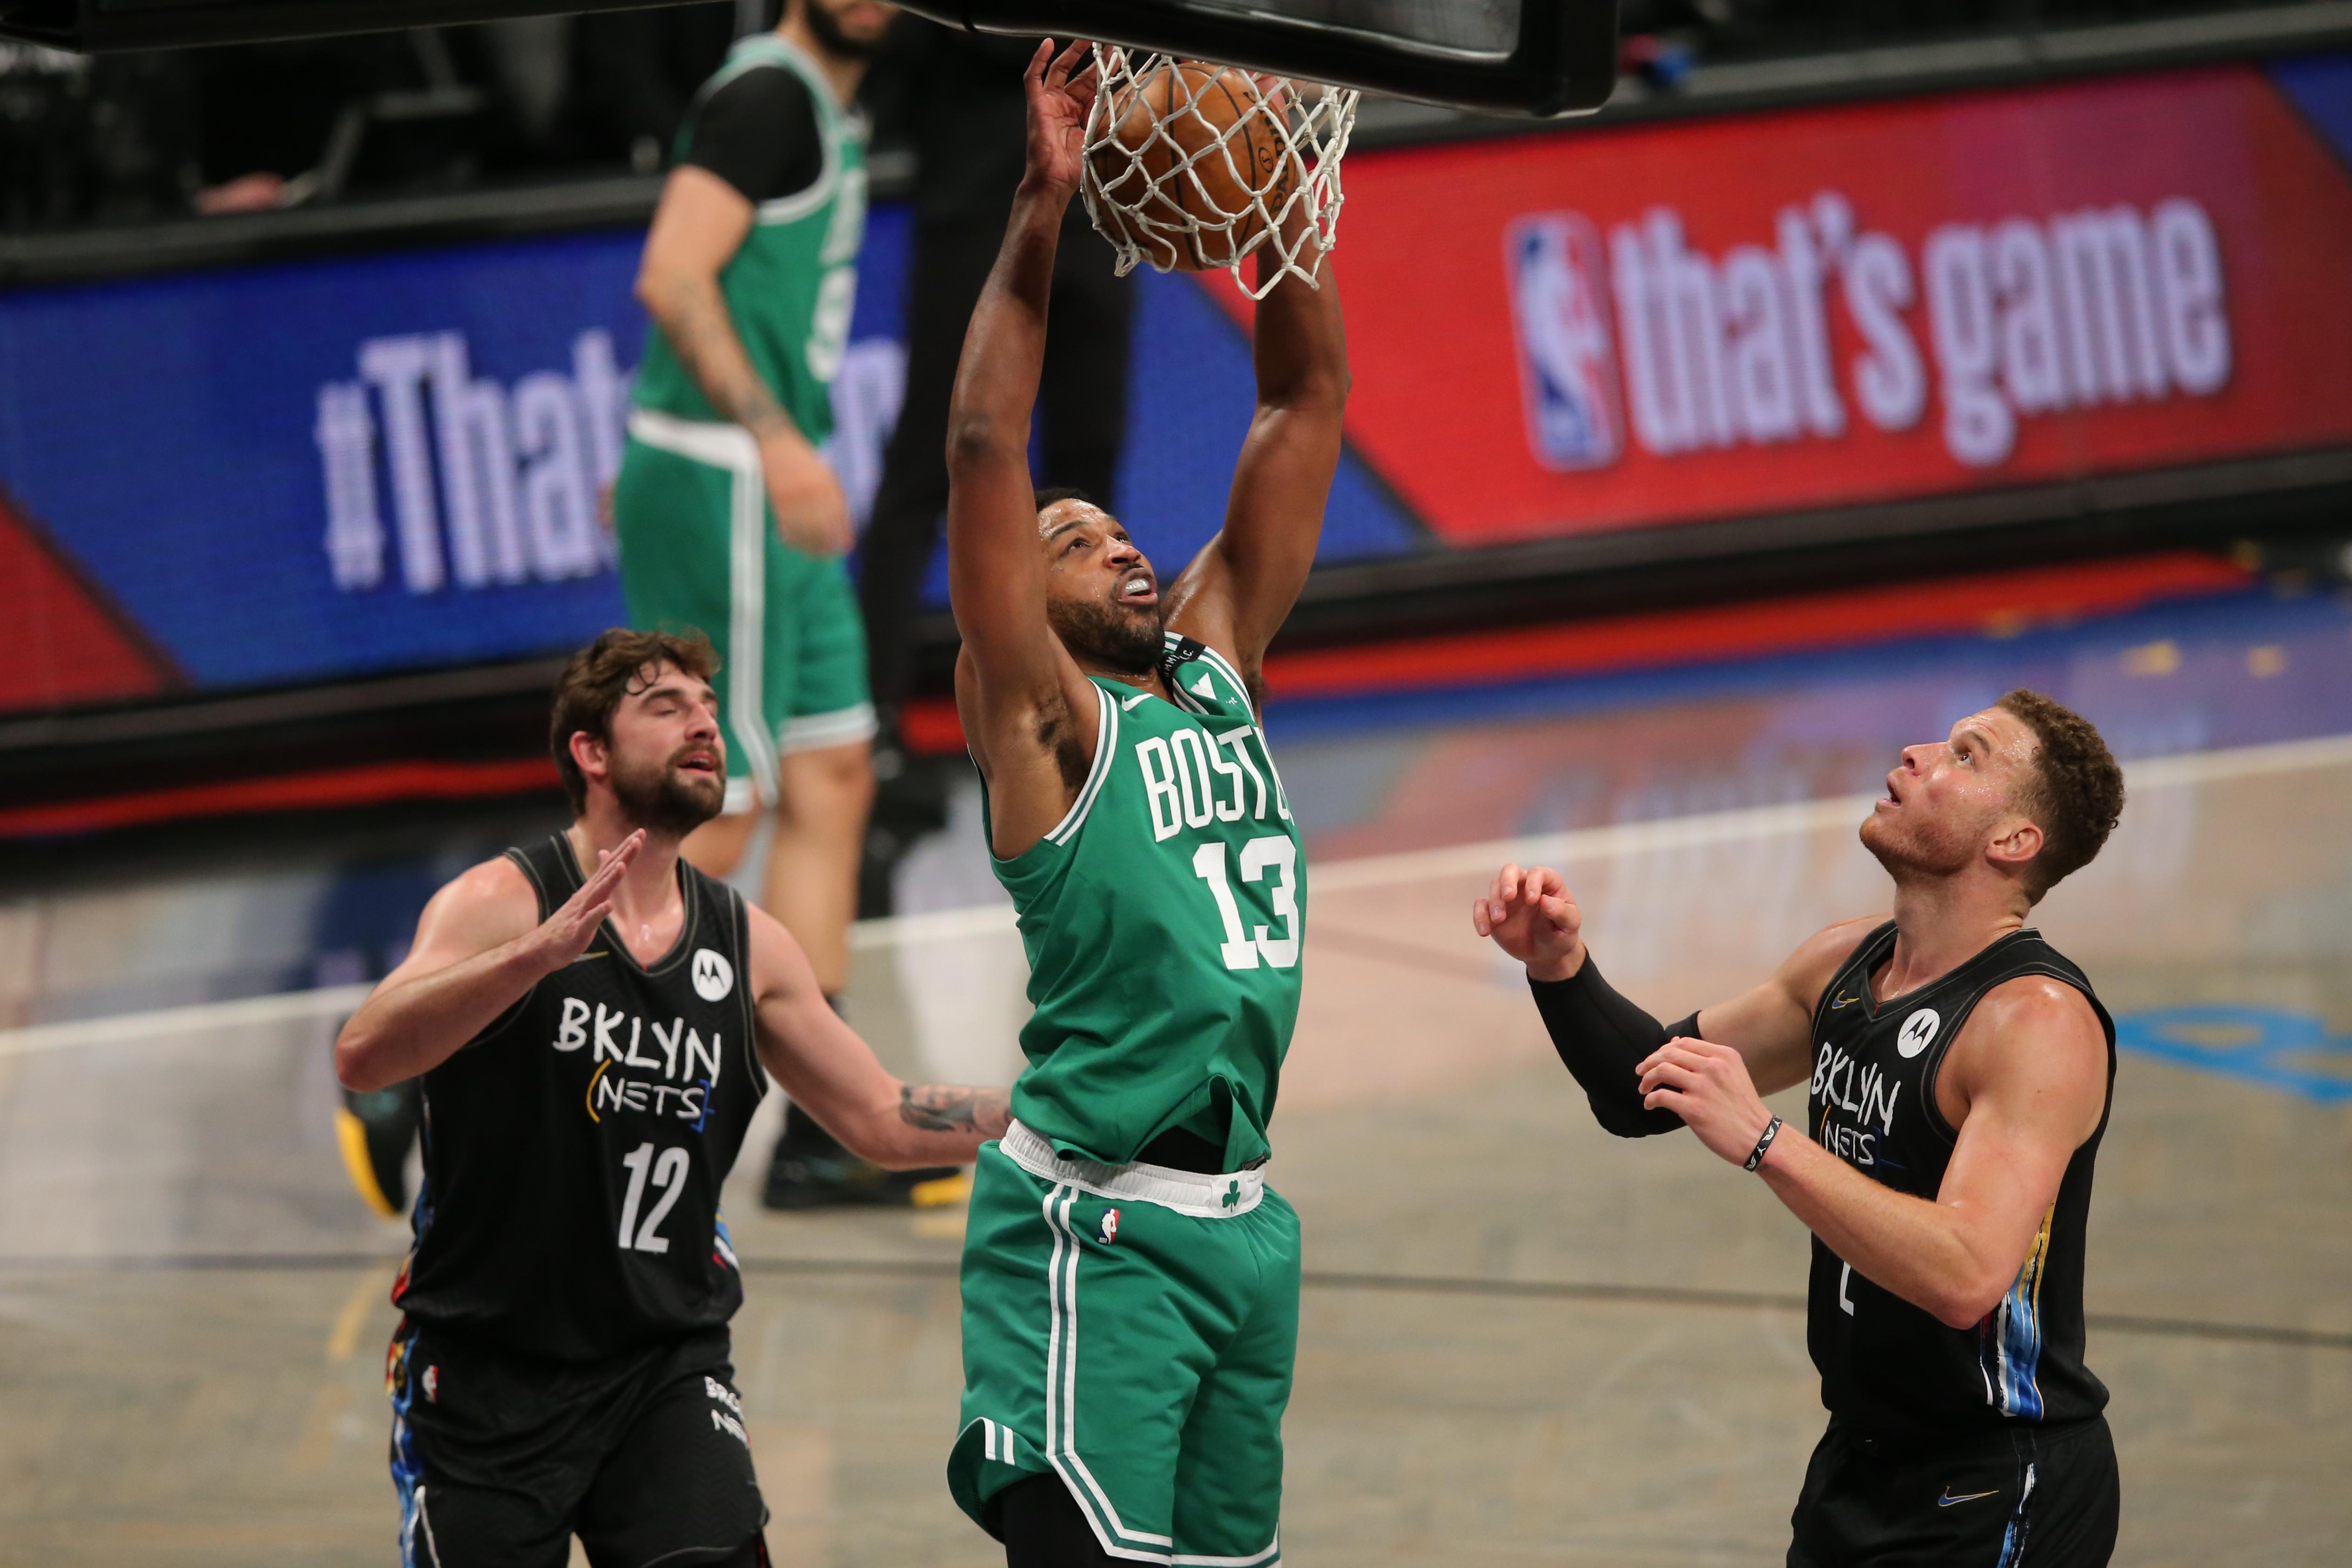 Tristan Thompson, Boston Celtics